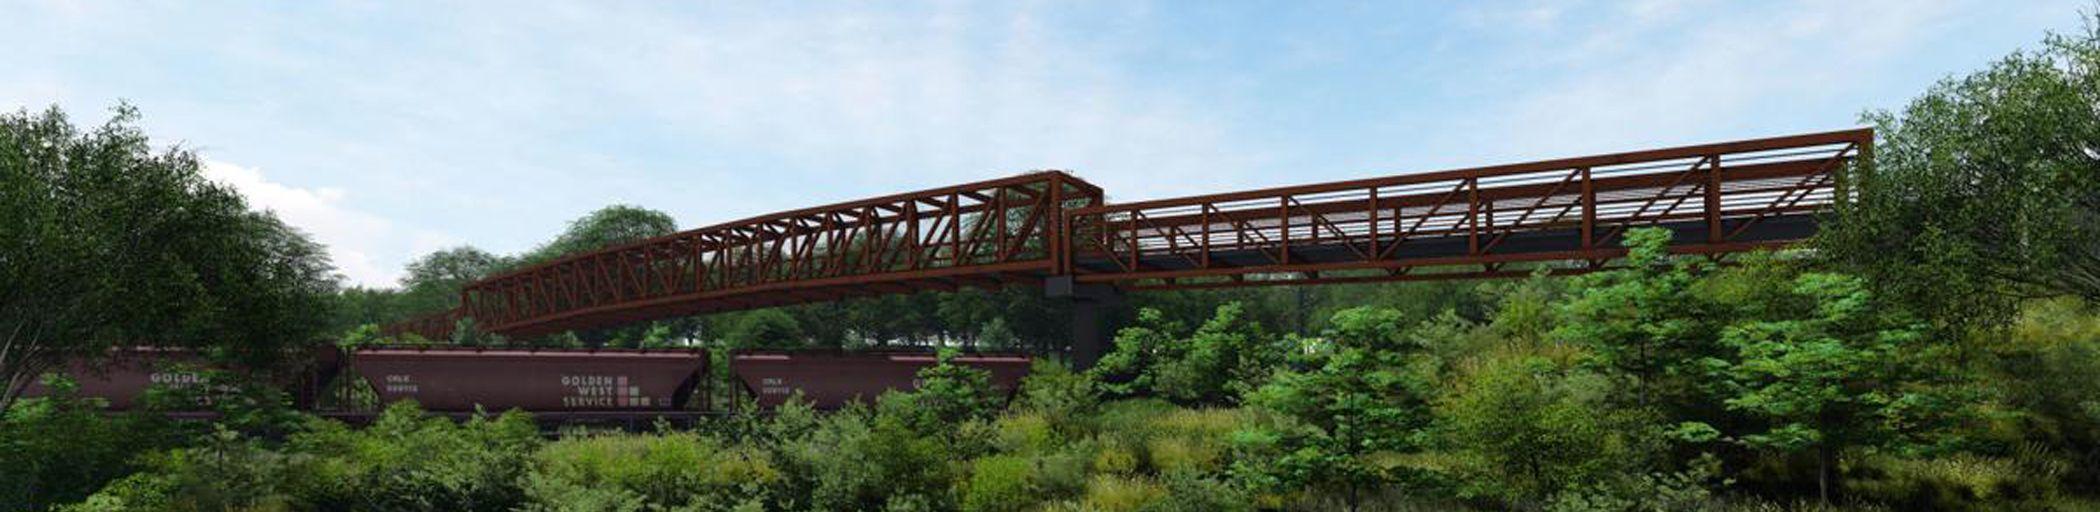 Trail Connector Bridge